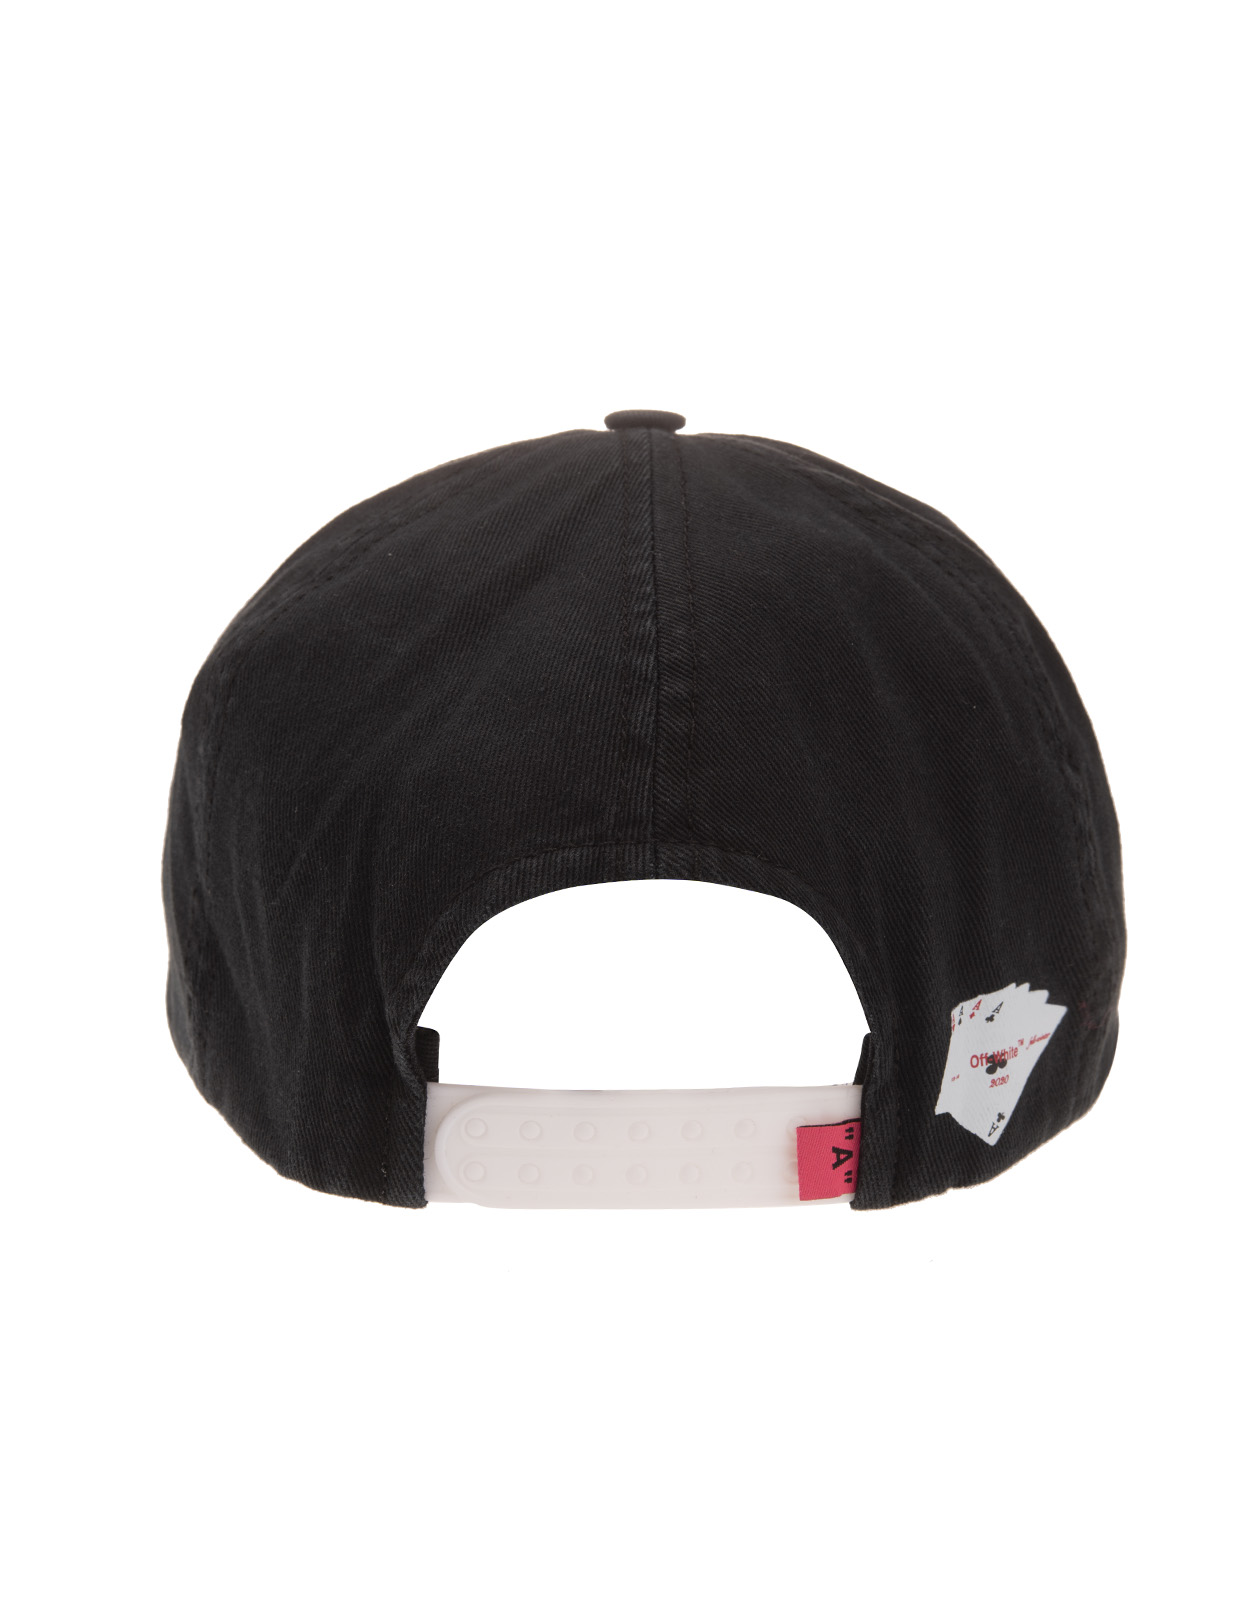 69c863aa Black Baseball Cap With Print And White Logo - OFF-WHITE - Russocapri